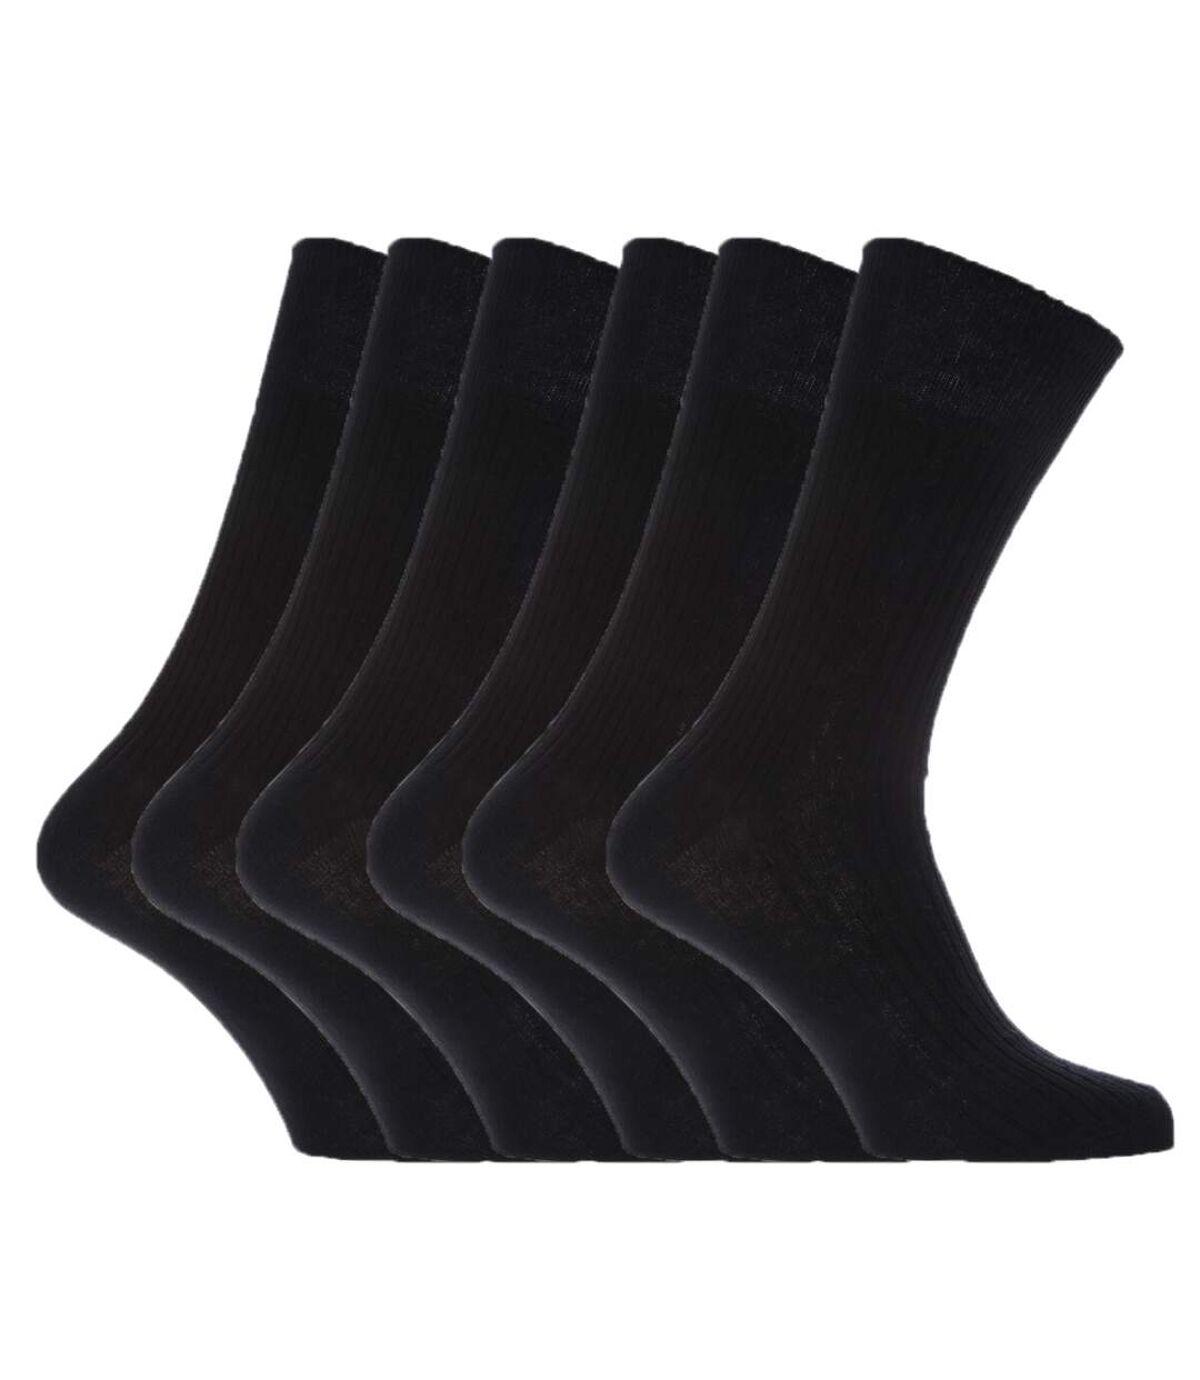 Mens 100% Cotton Non Elastic Top Gentle Grip Socks (Pack Of 6) (Black) - UTMB198